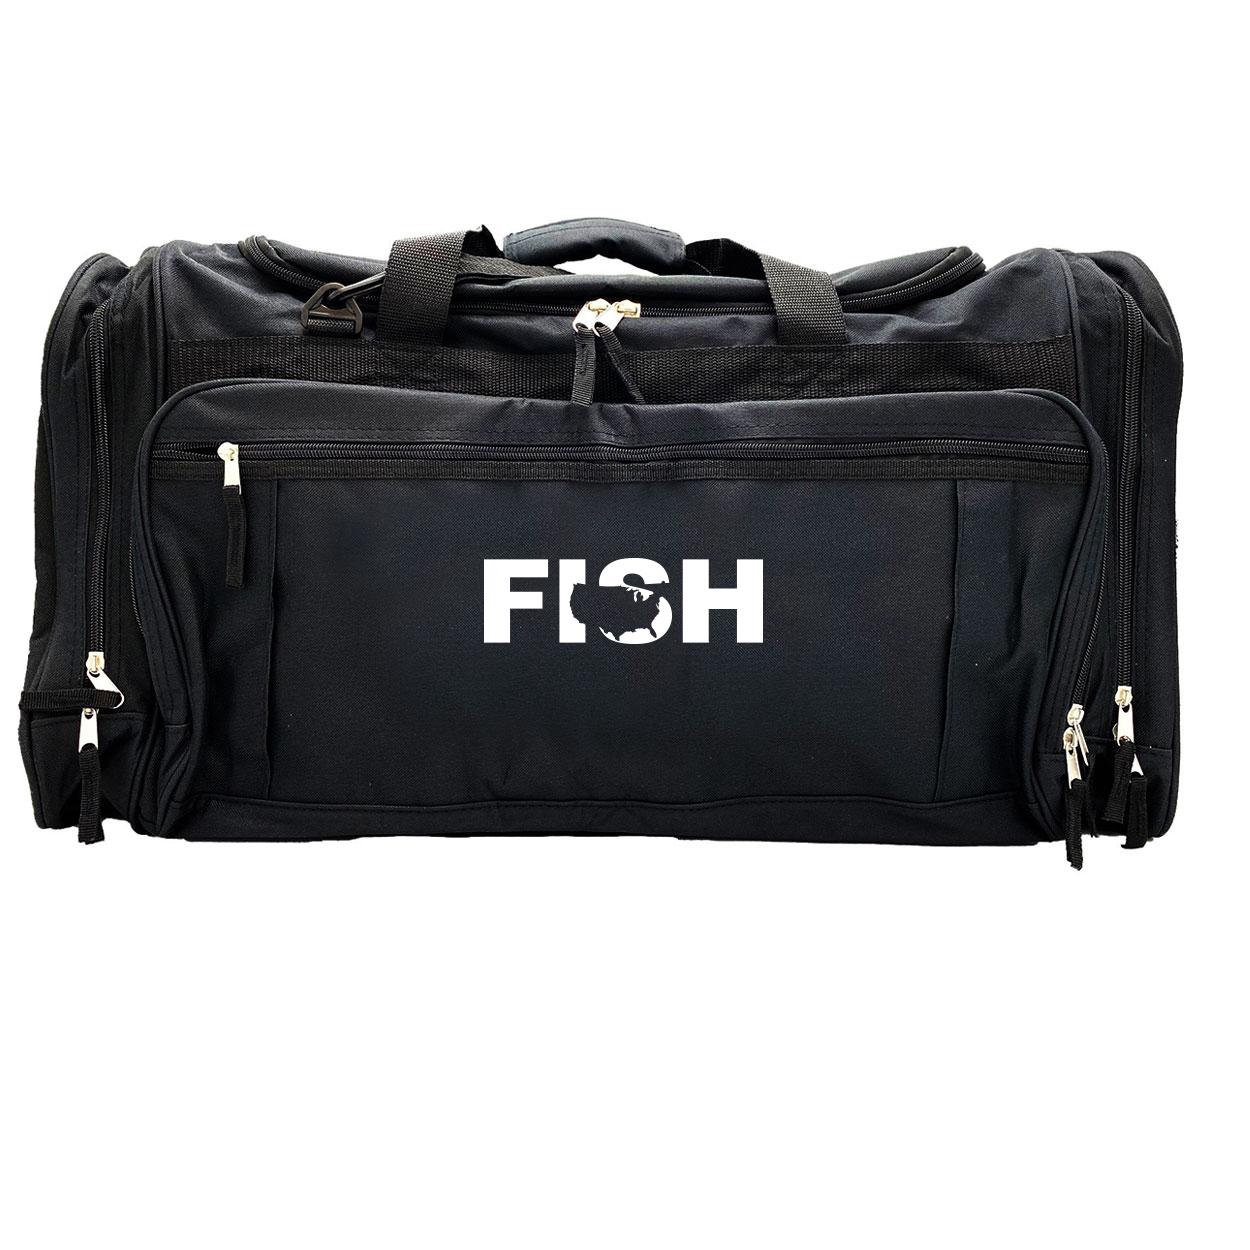 Fish United States Classic Explorer Large Duffel Bag Black (White Logo)